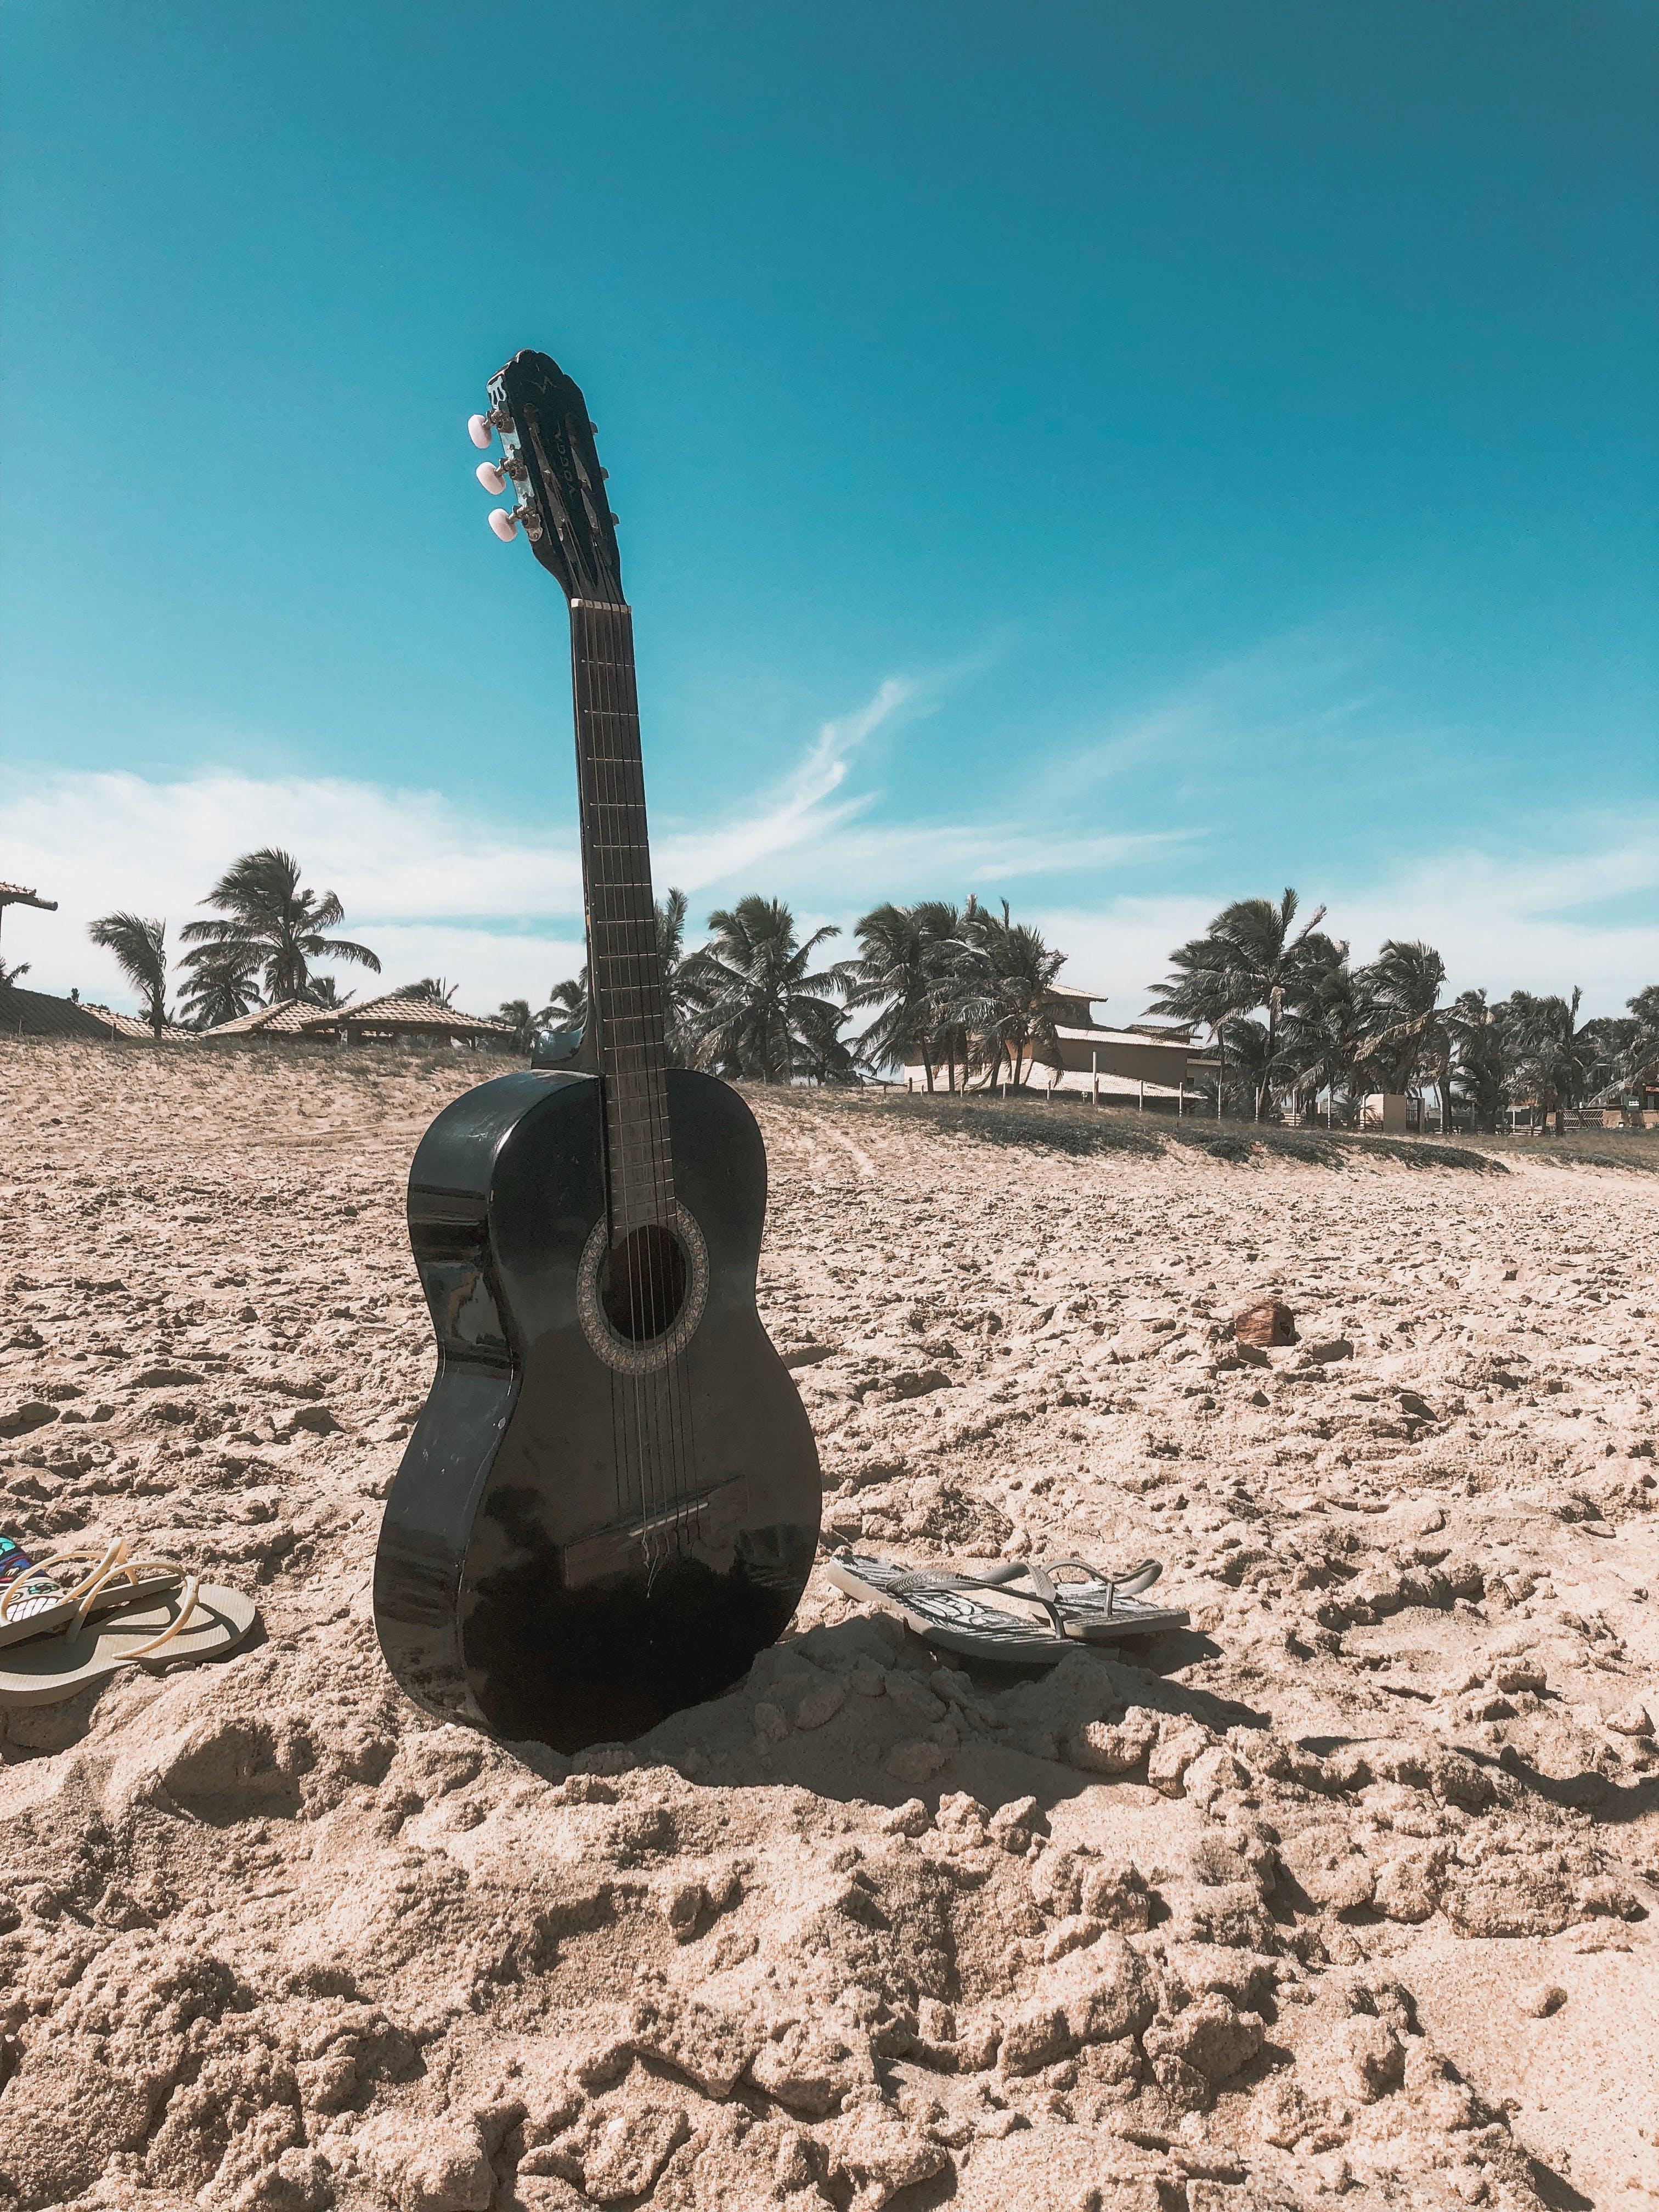 Gratis lagerfoto af guitar, musikinstrument, sand, strenginstrumenter